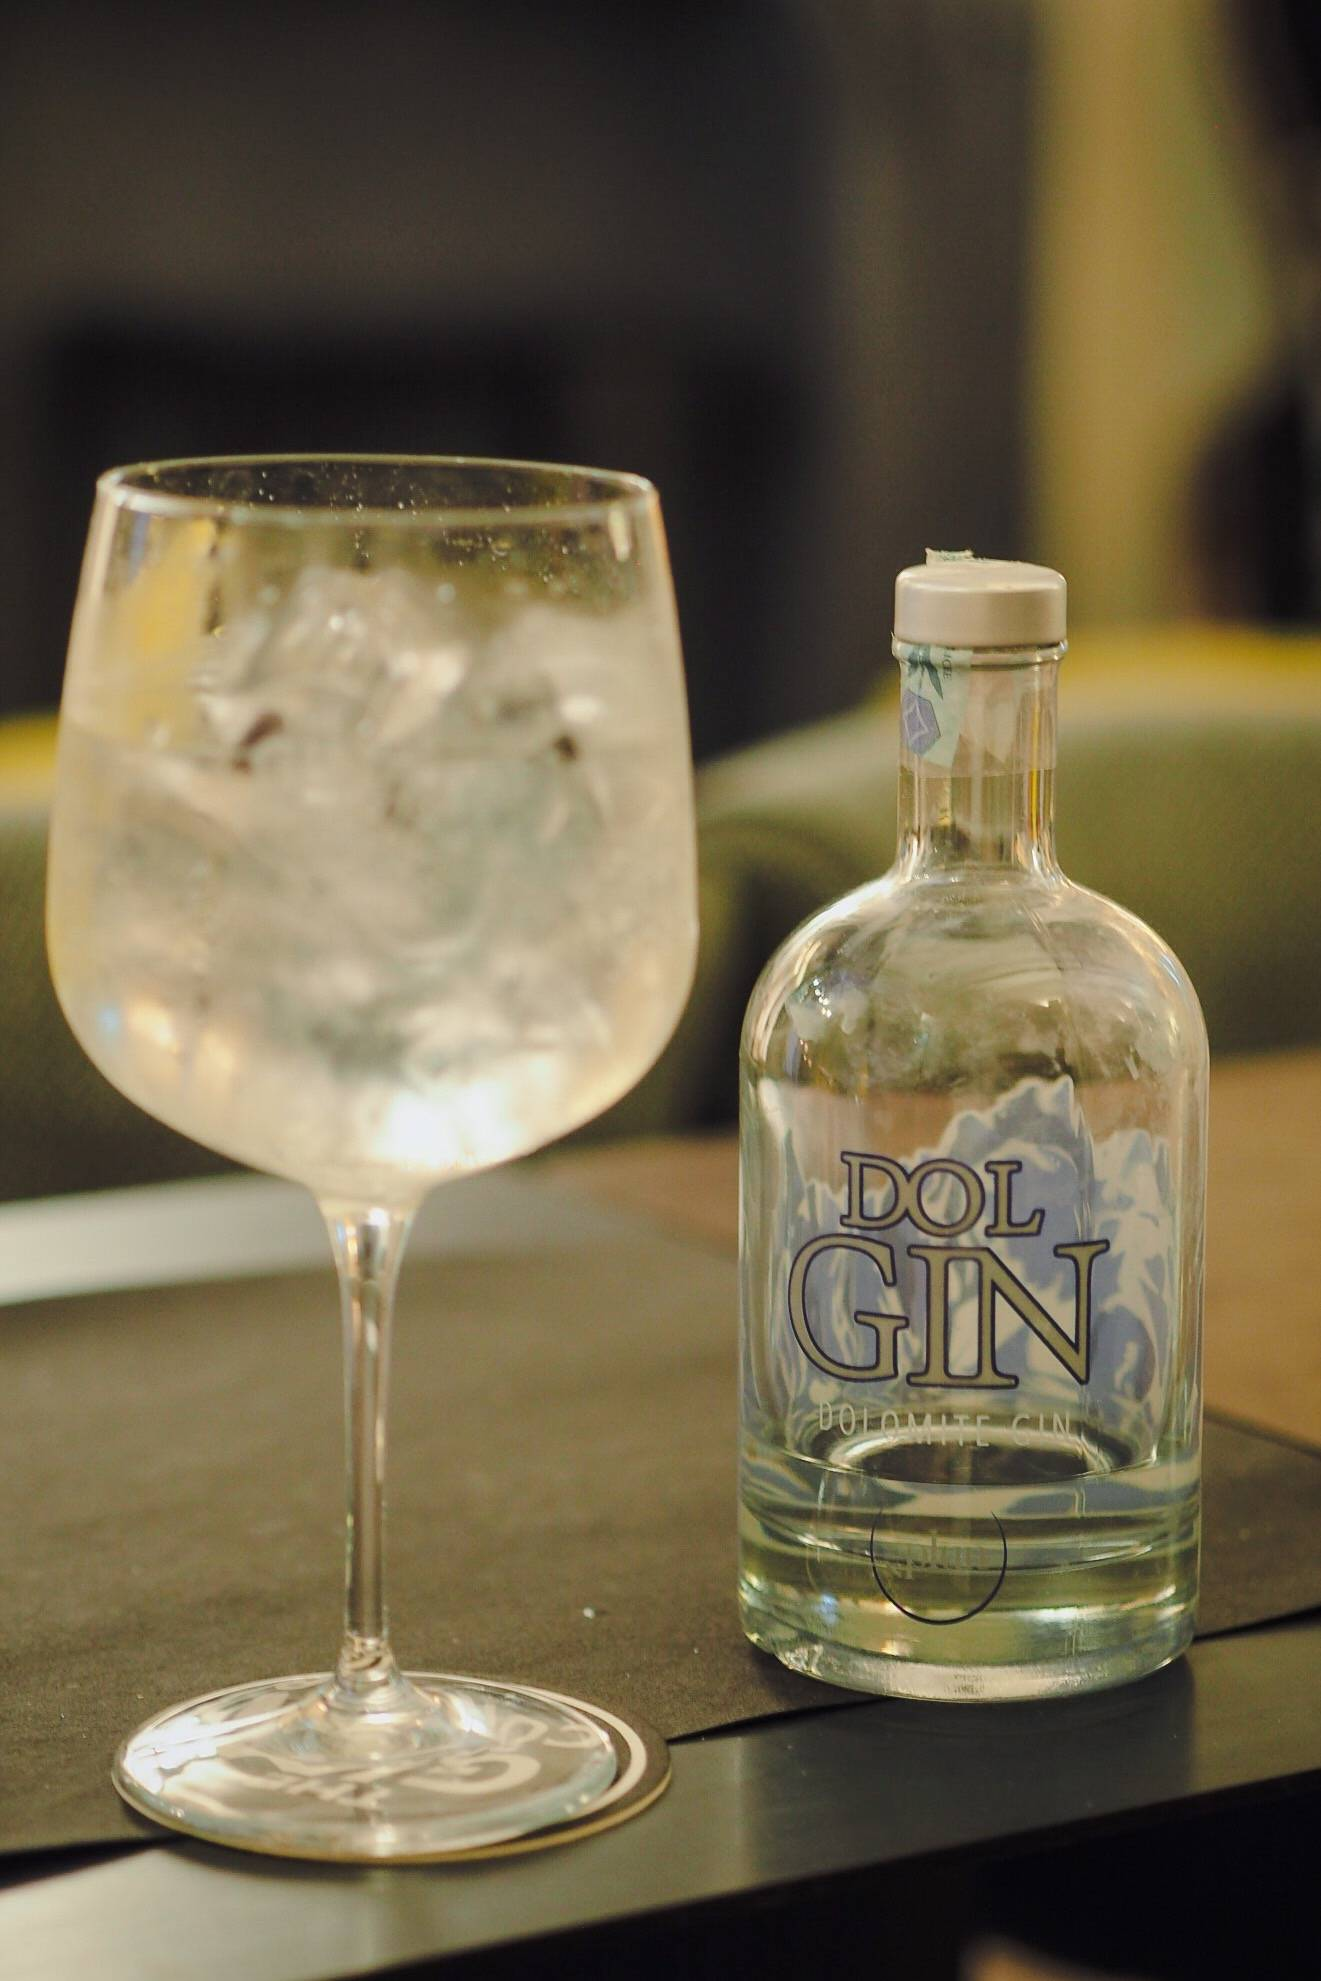 Rome_City_guide_Gin_Corner_Dol_gin